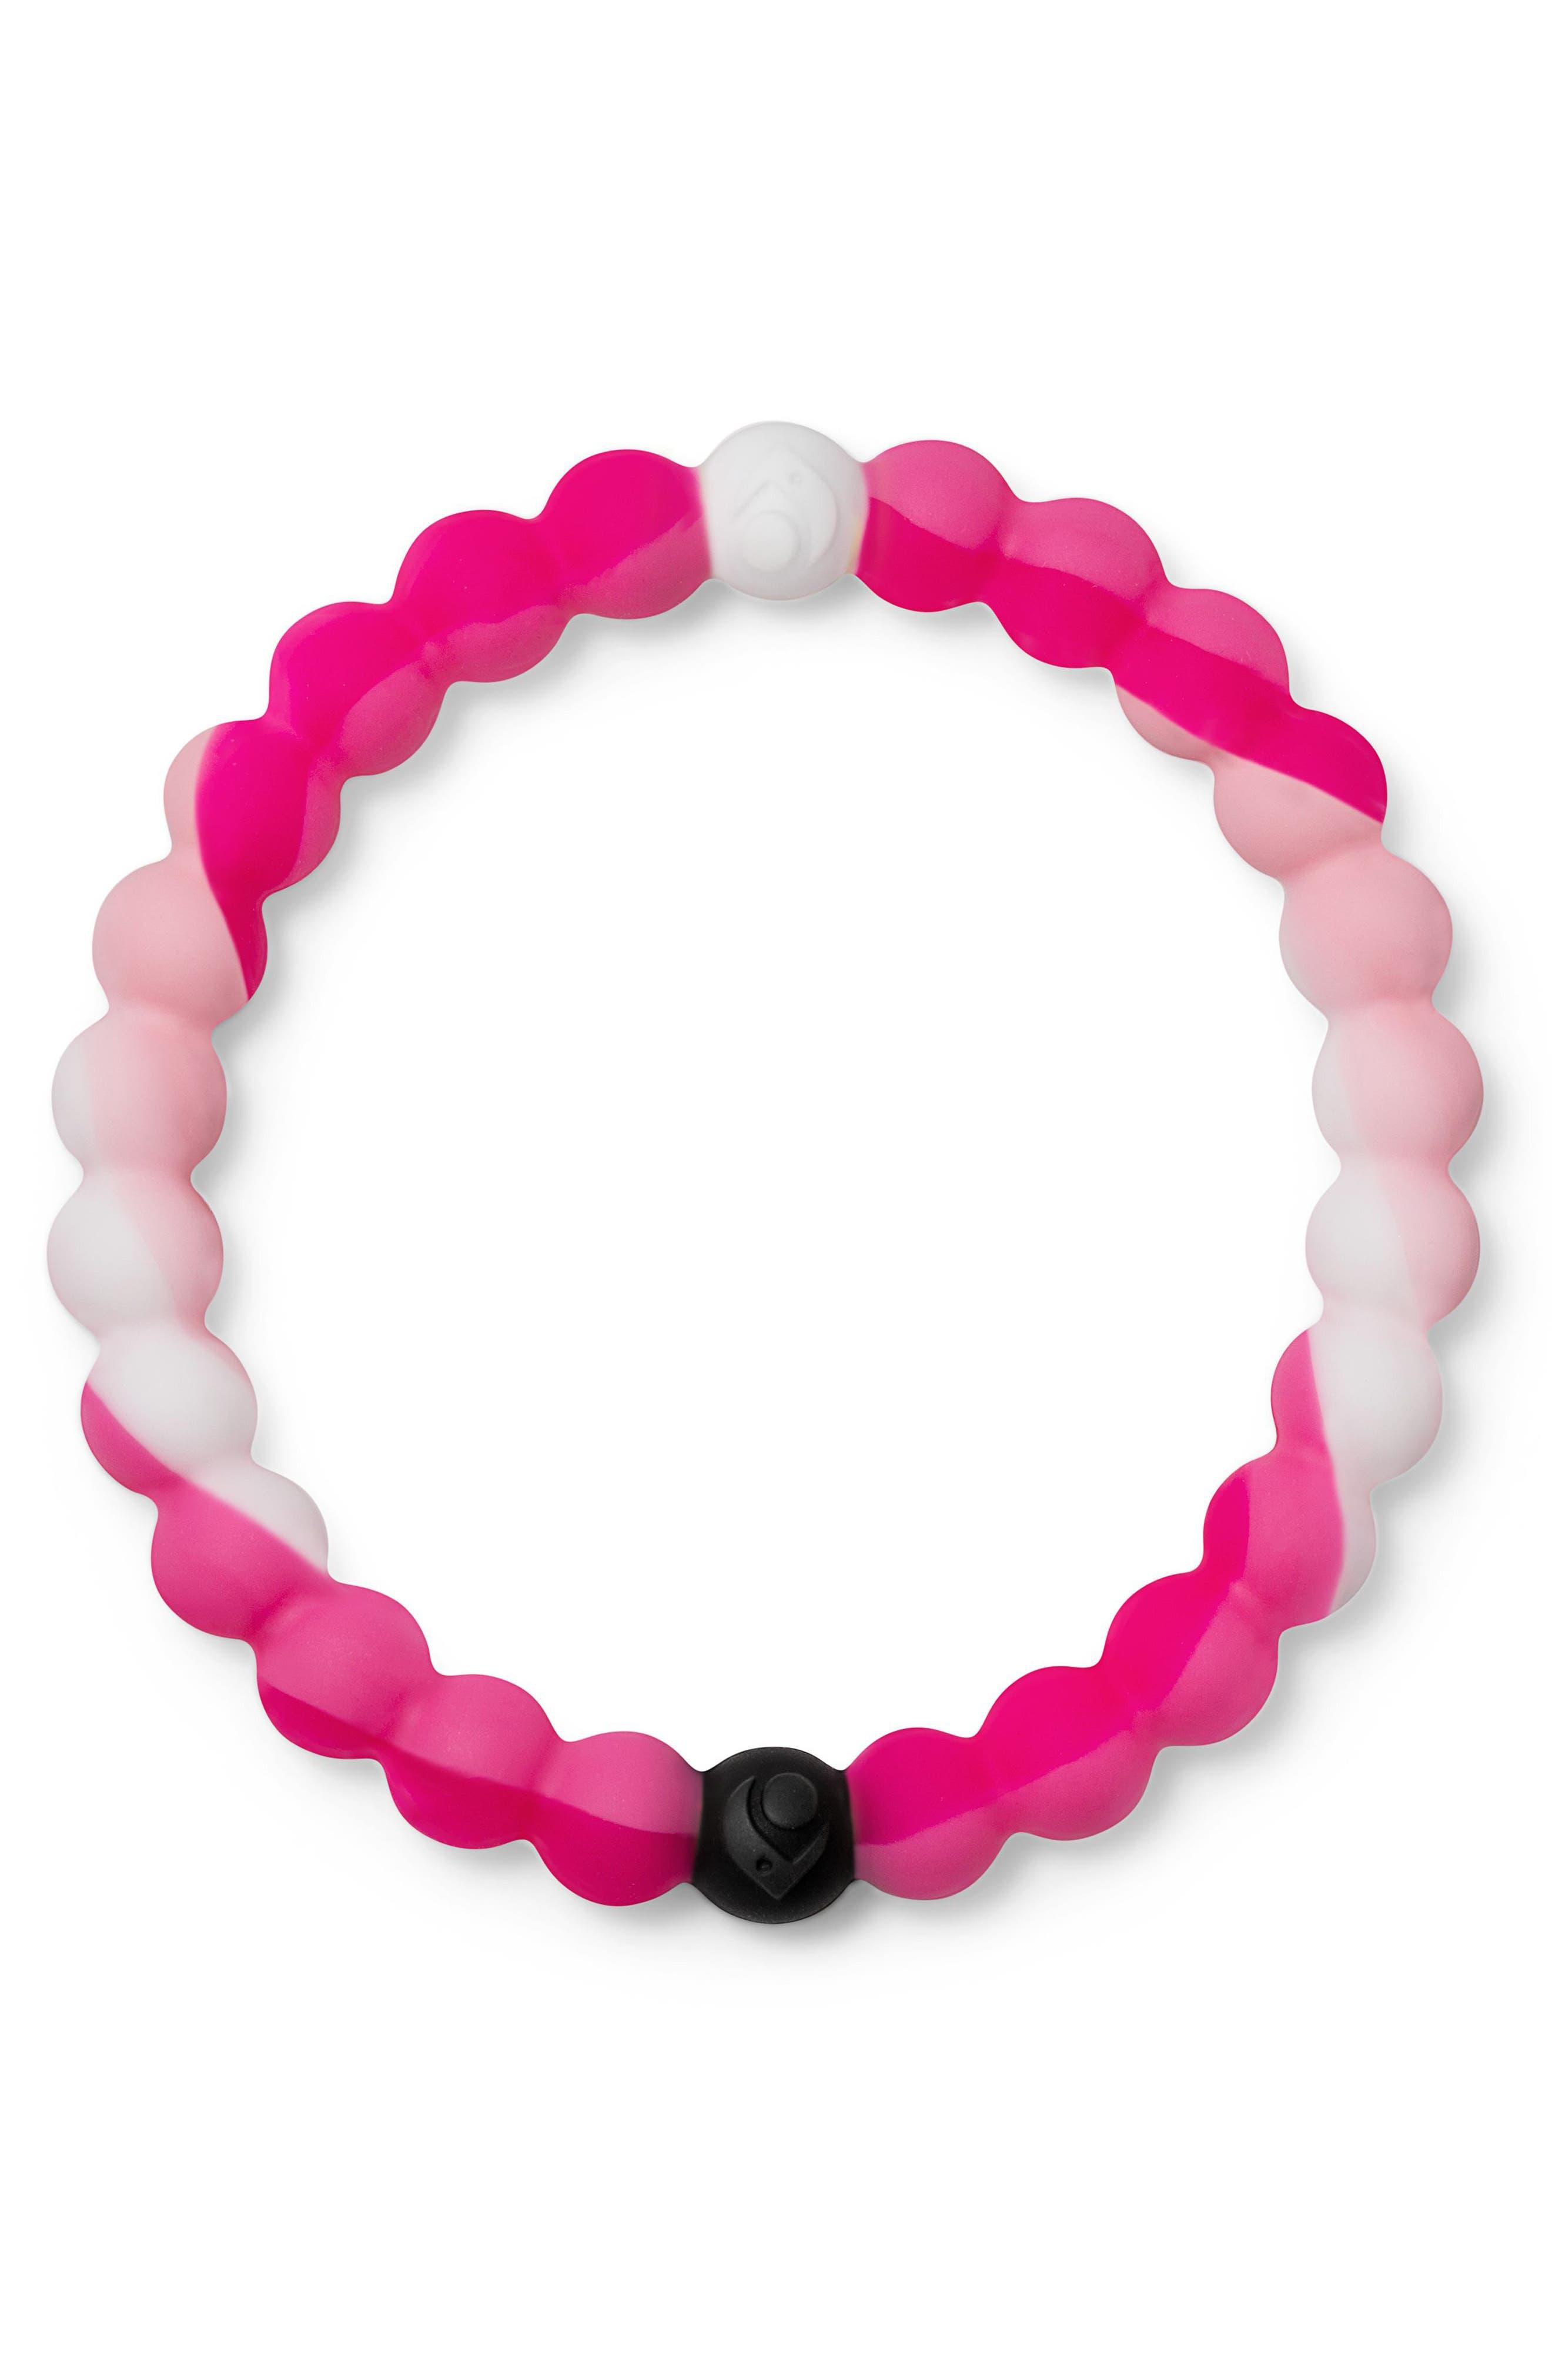 Limited Edition Pink Bracelet,                             Main thumbnail 1, color,                             650